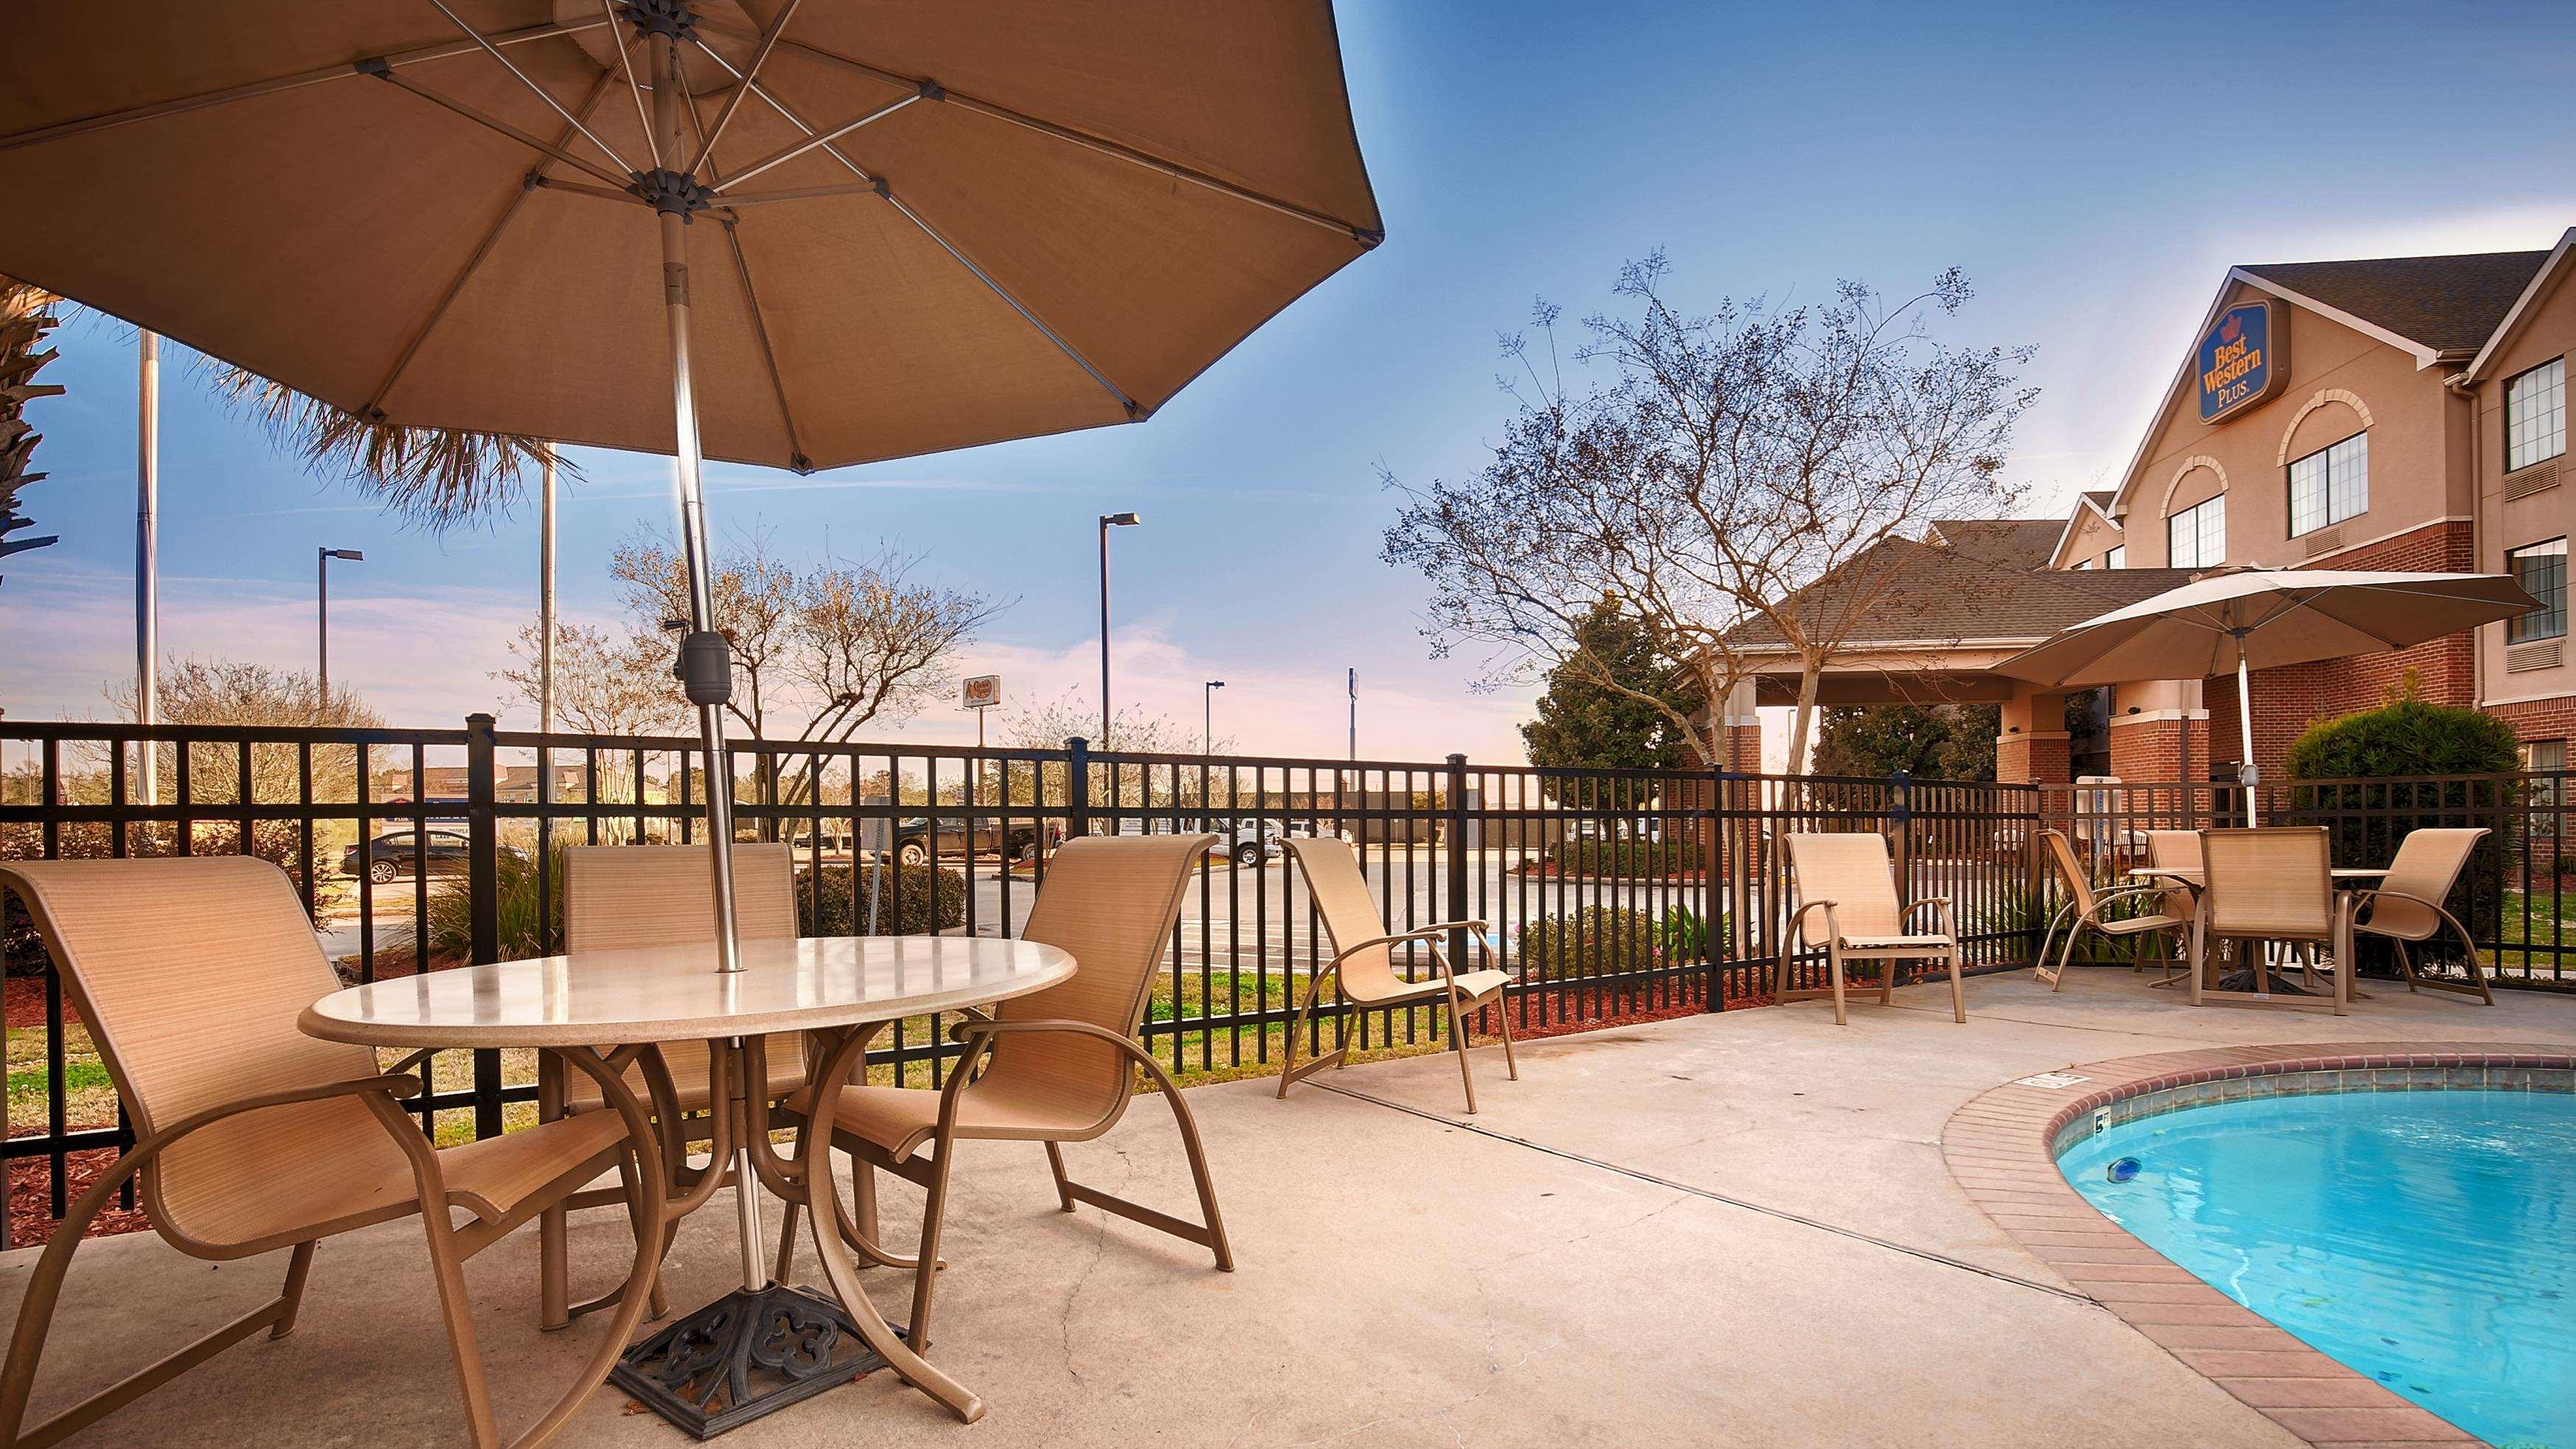 Best Western Plus Executive Hotel & Suites image 11